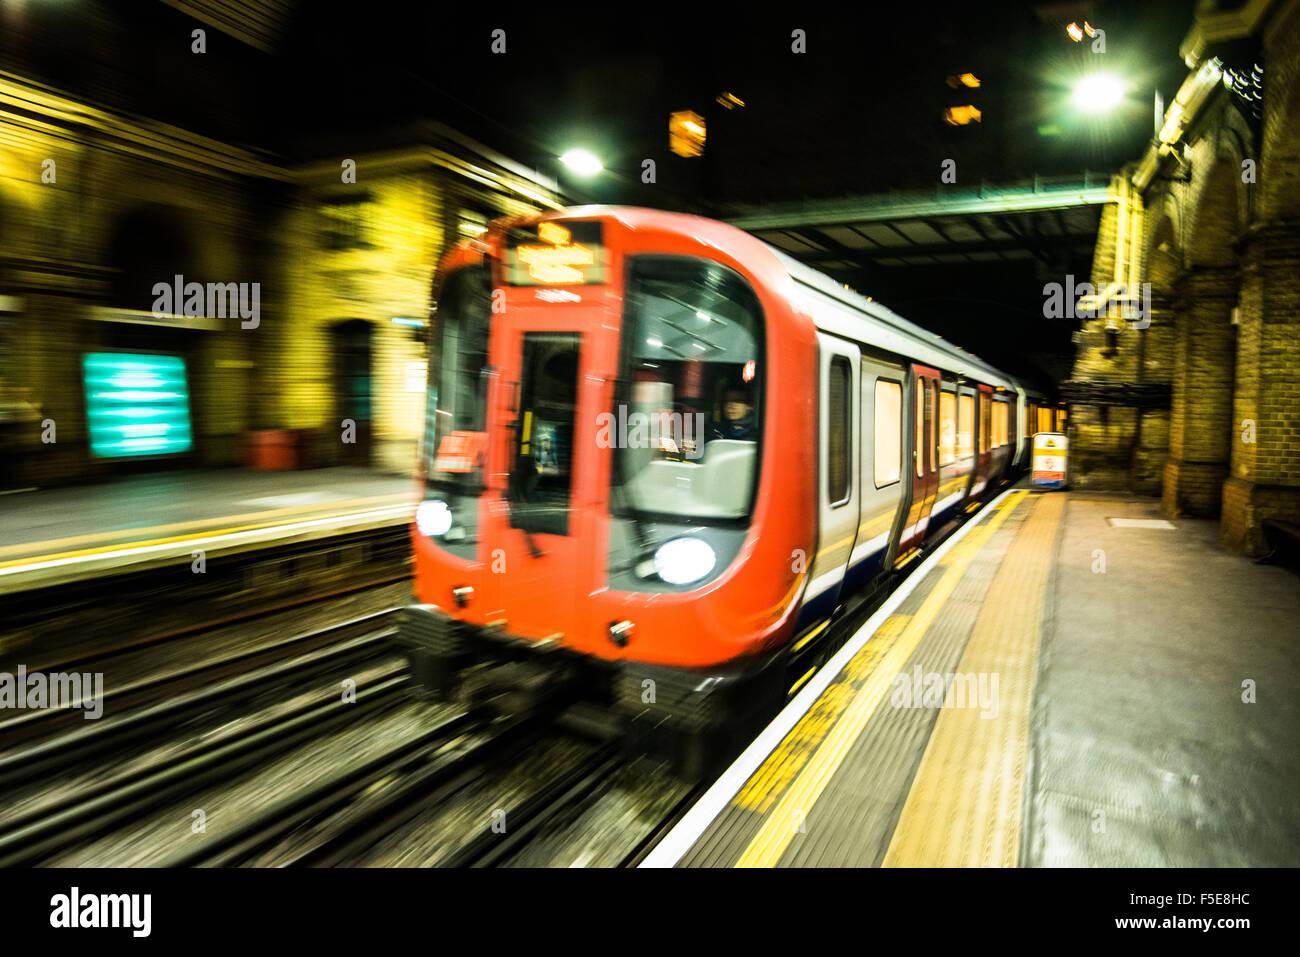 London Tube train in motion, London, England, United Kingdom, Europe - Stock Image